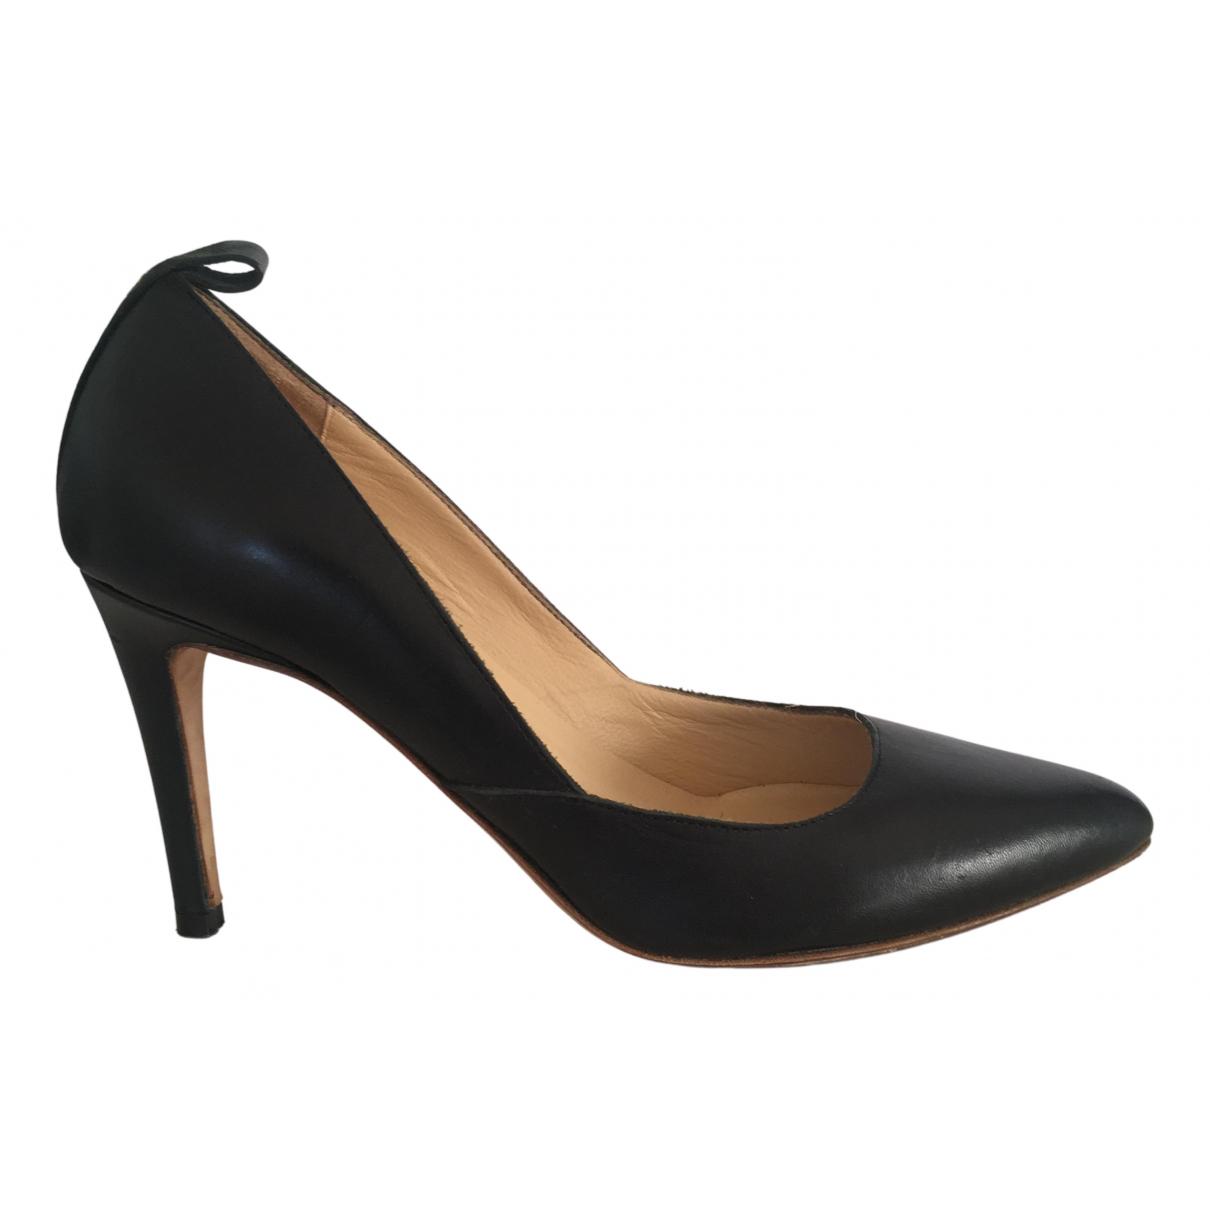 Atp Atelier N Black Leather Heels for Women 37 EU